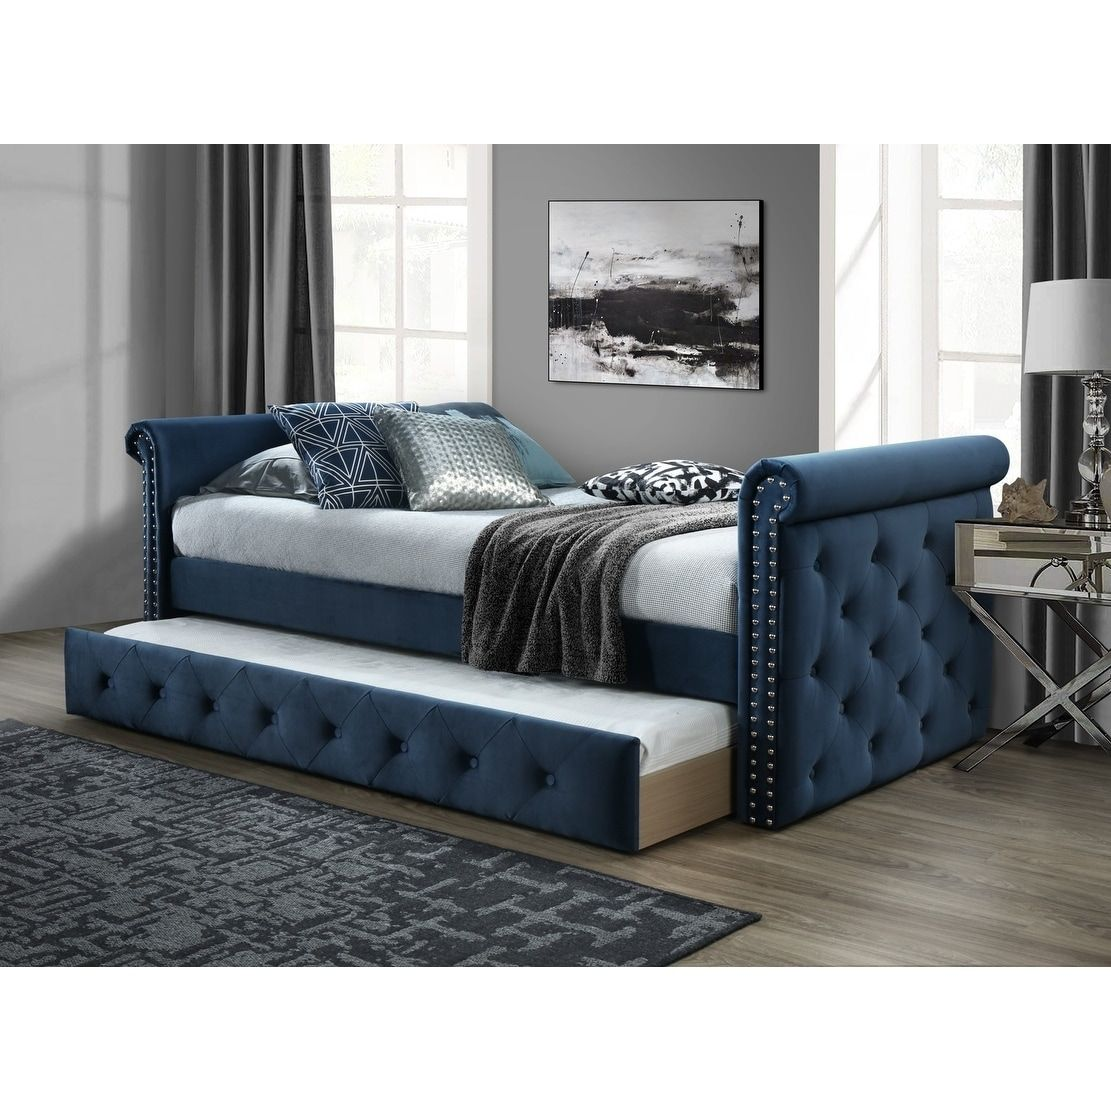 Helius Twin Storage Platform Bed In 2021 Bed Frame With Storage Wood Platform Bed Bed Frame With Drawers